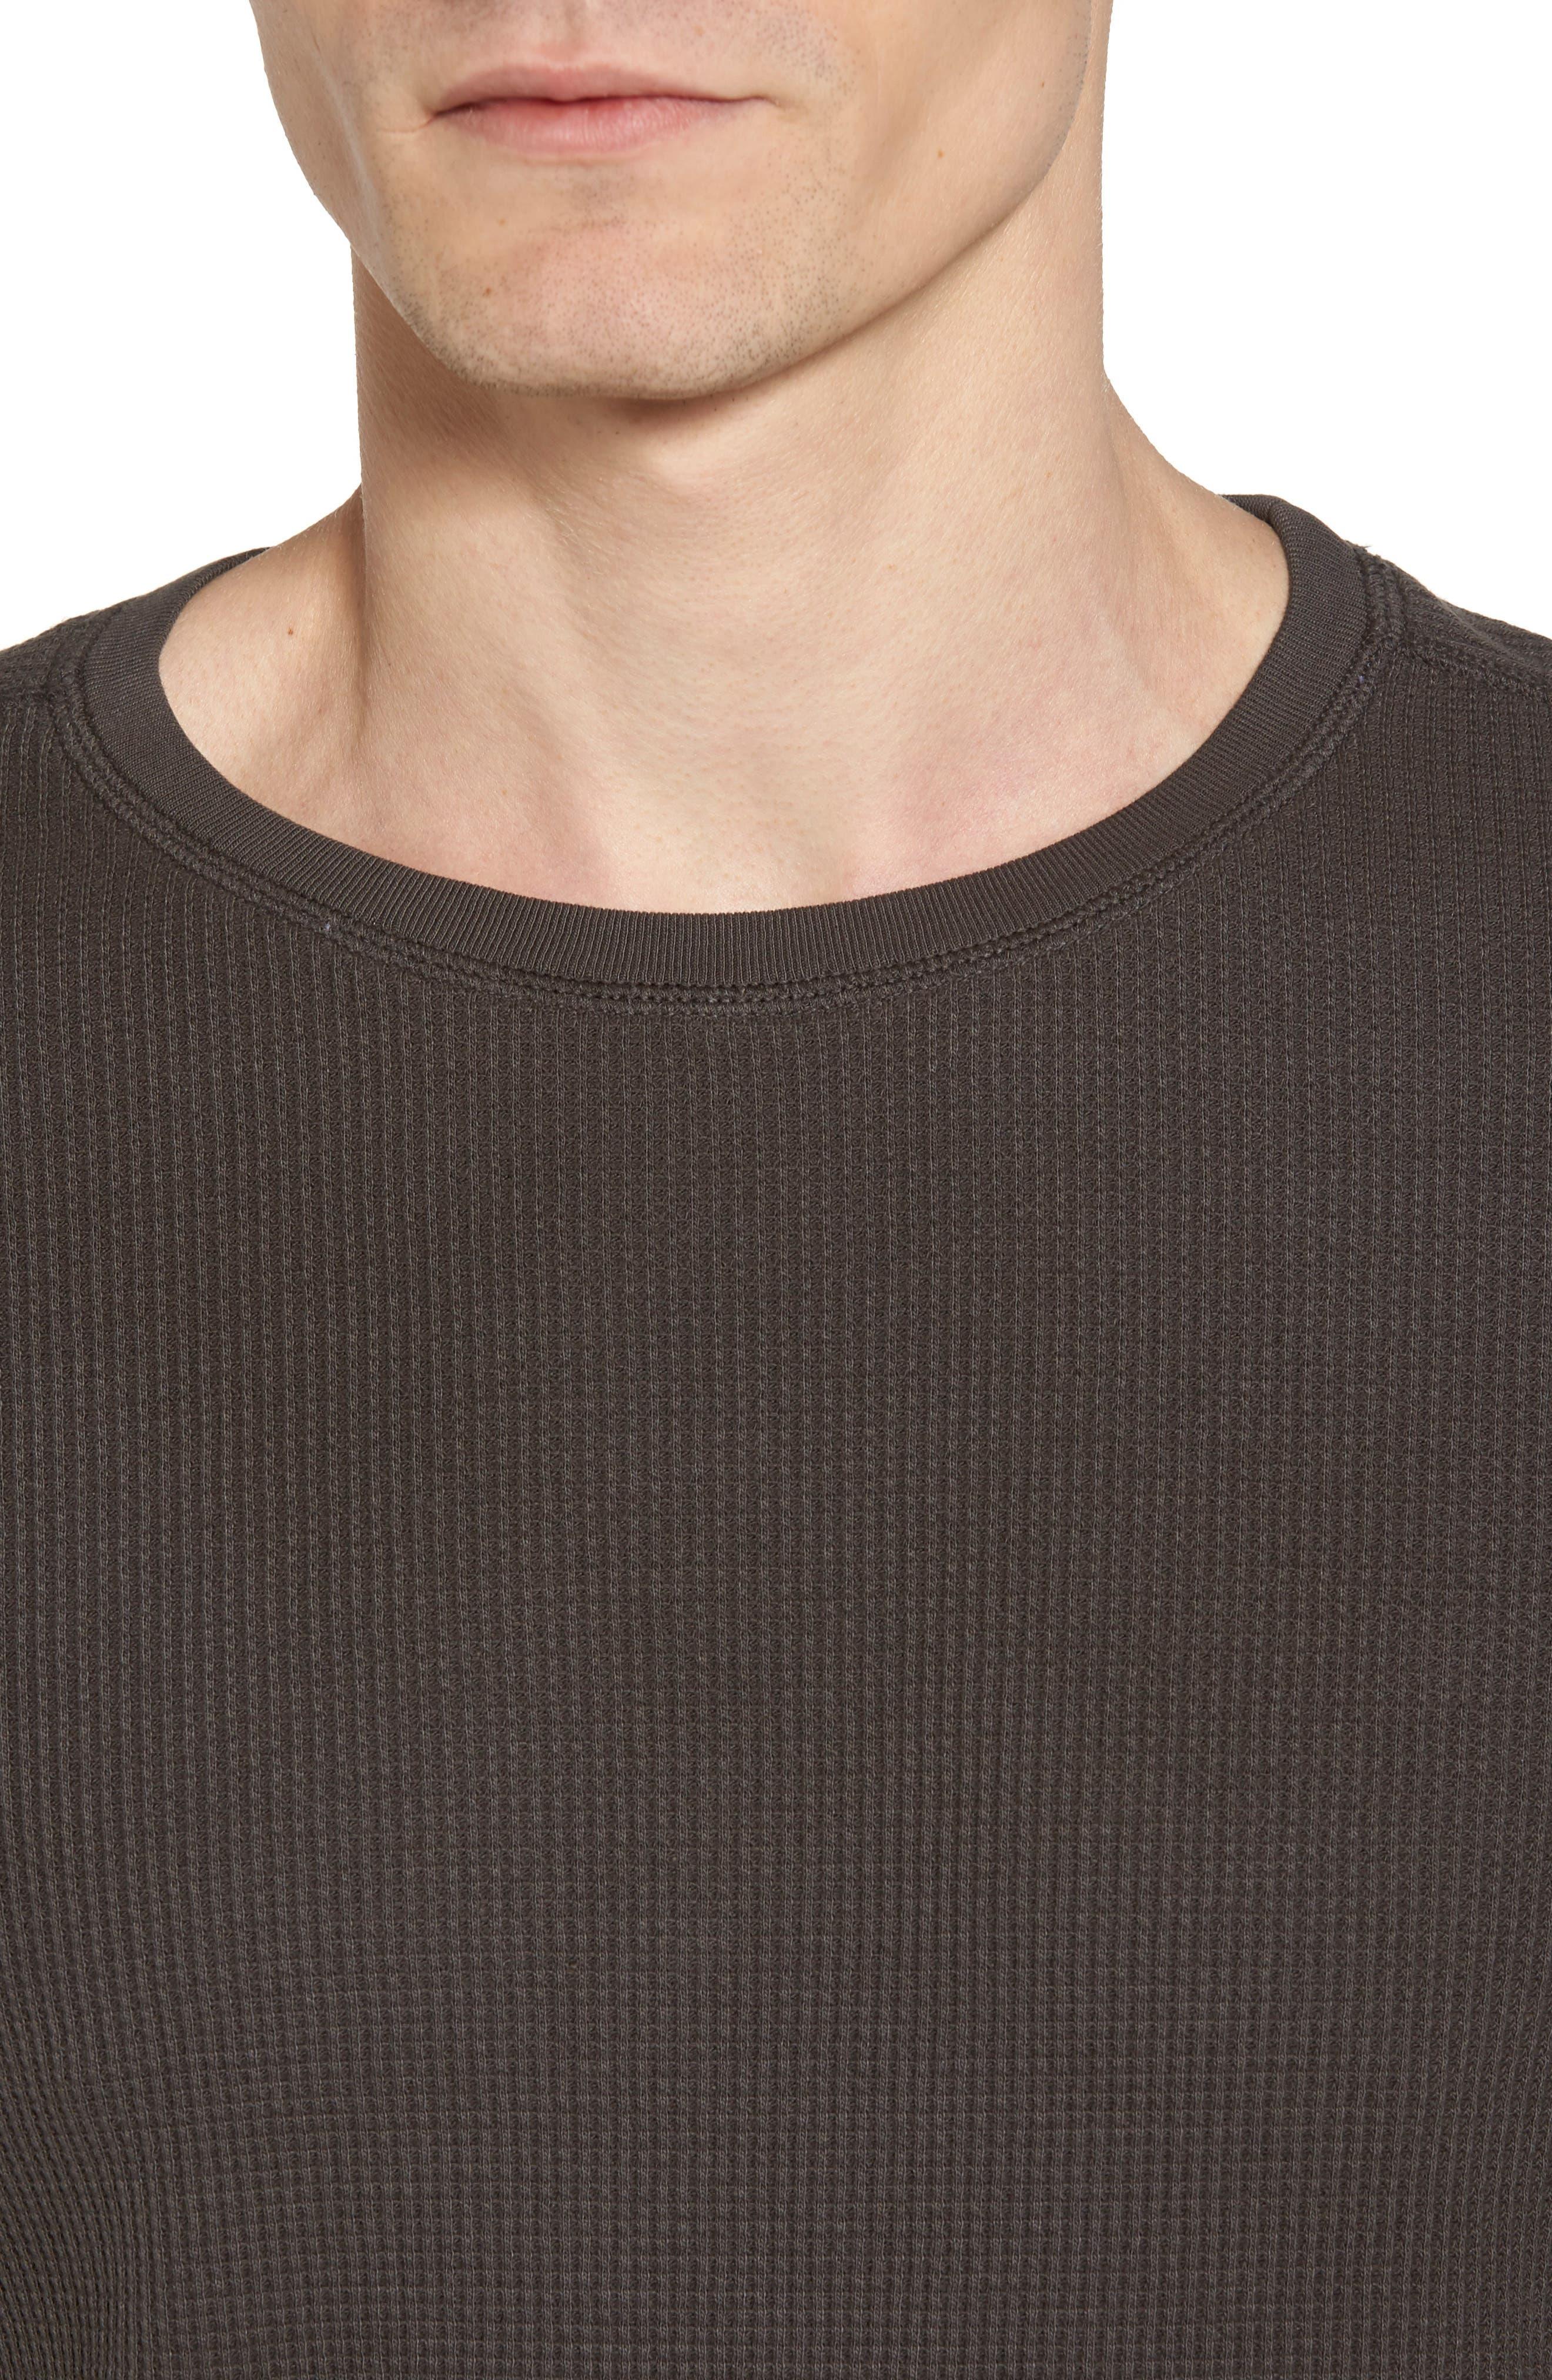 Trevor Slim Fit Crewneck Shirt,                             Alternate thumbnail 4, color,                             Smoke Grey